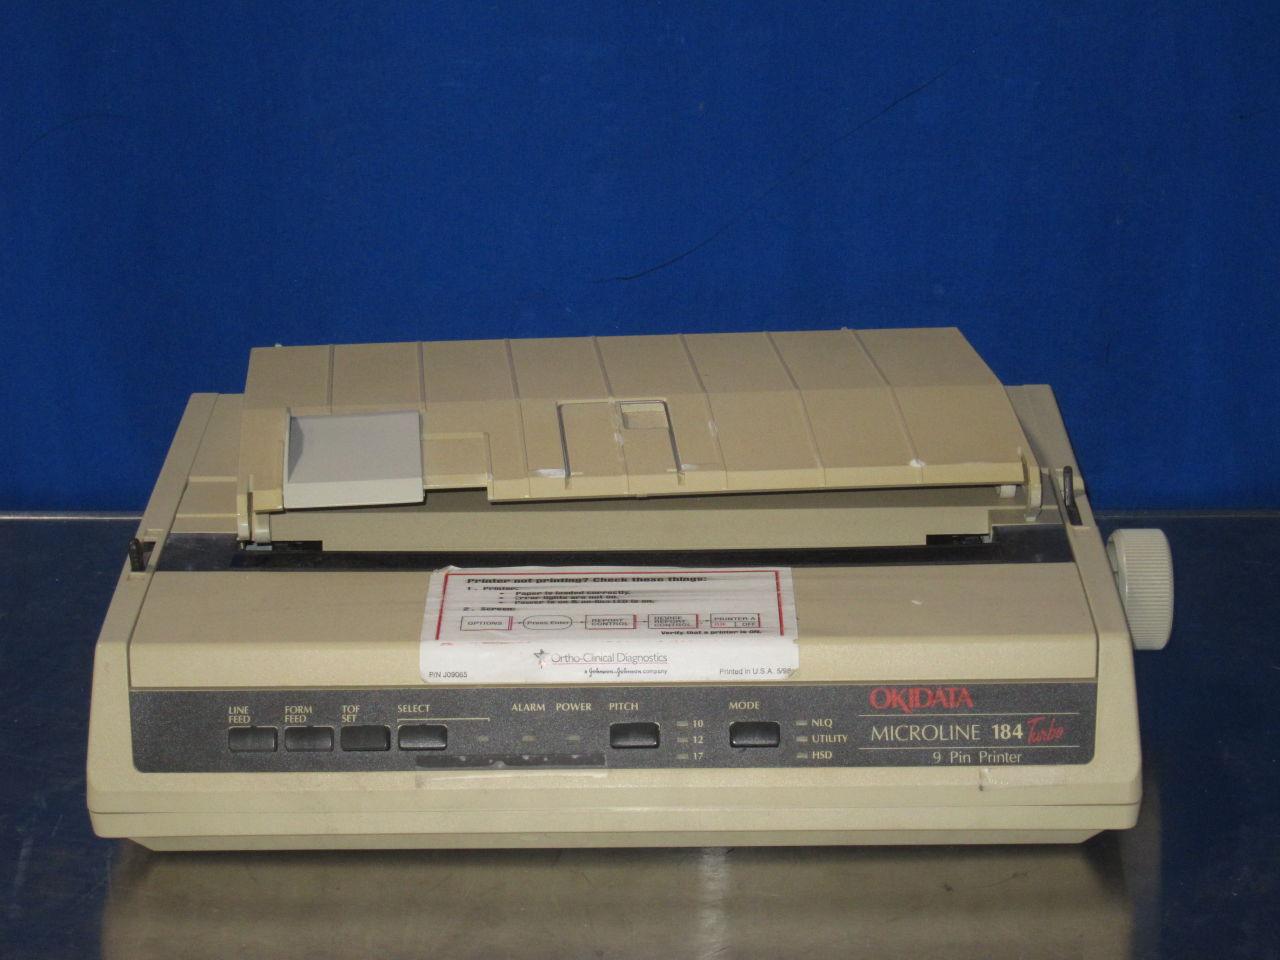 OKIDATA Microline 184 Turbo Printer